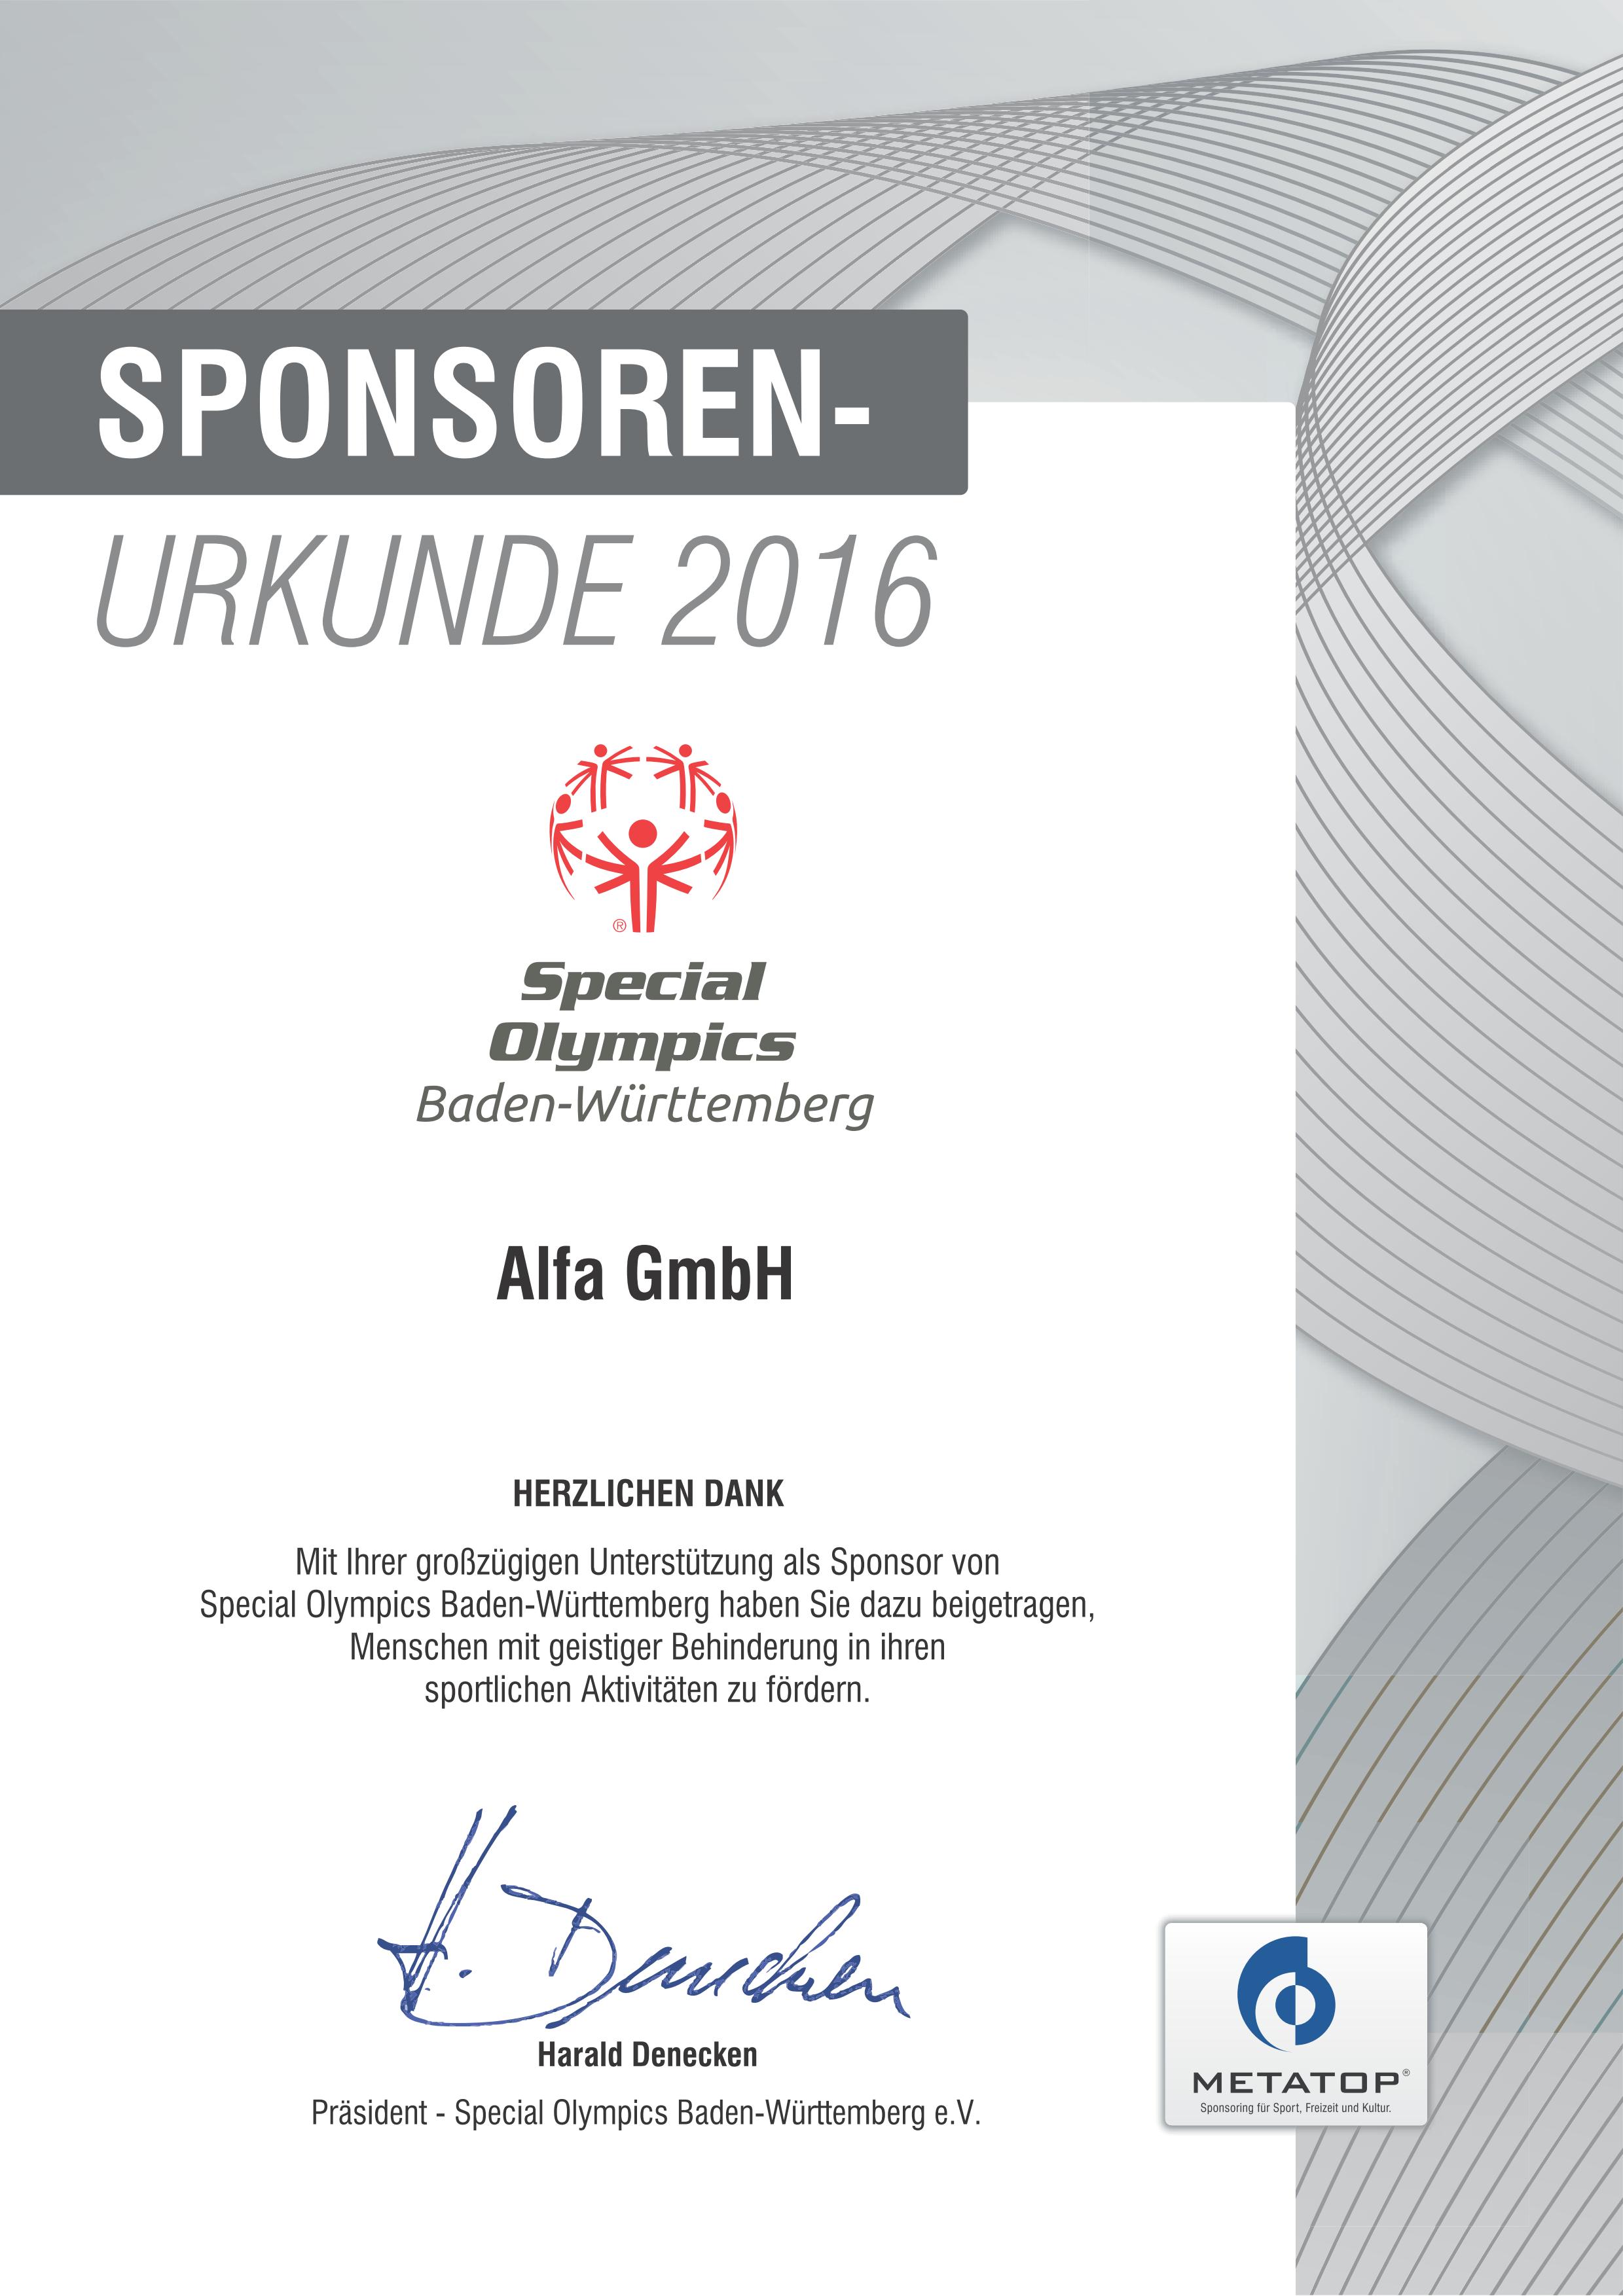 Sponsor bei den Special Olympics in Baden-Württemberg